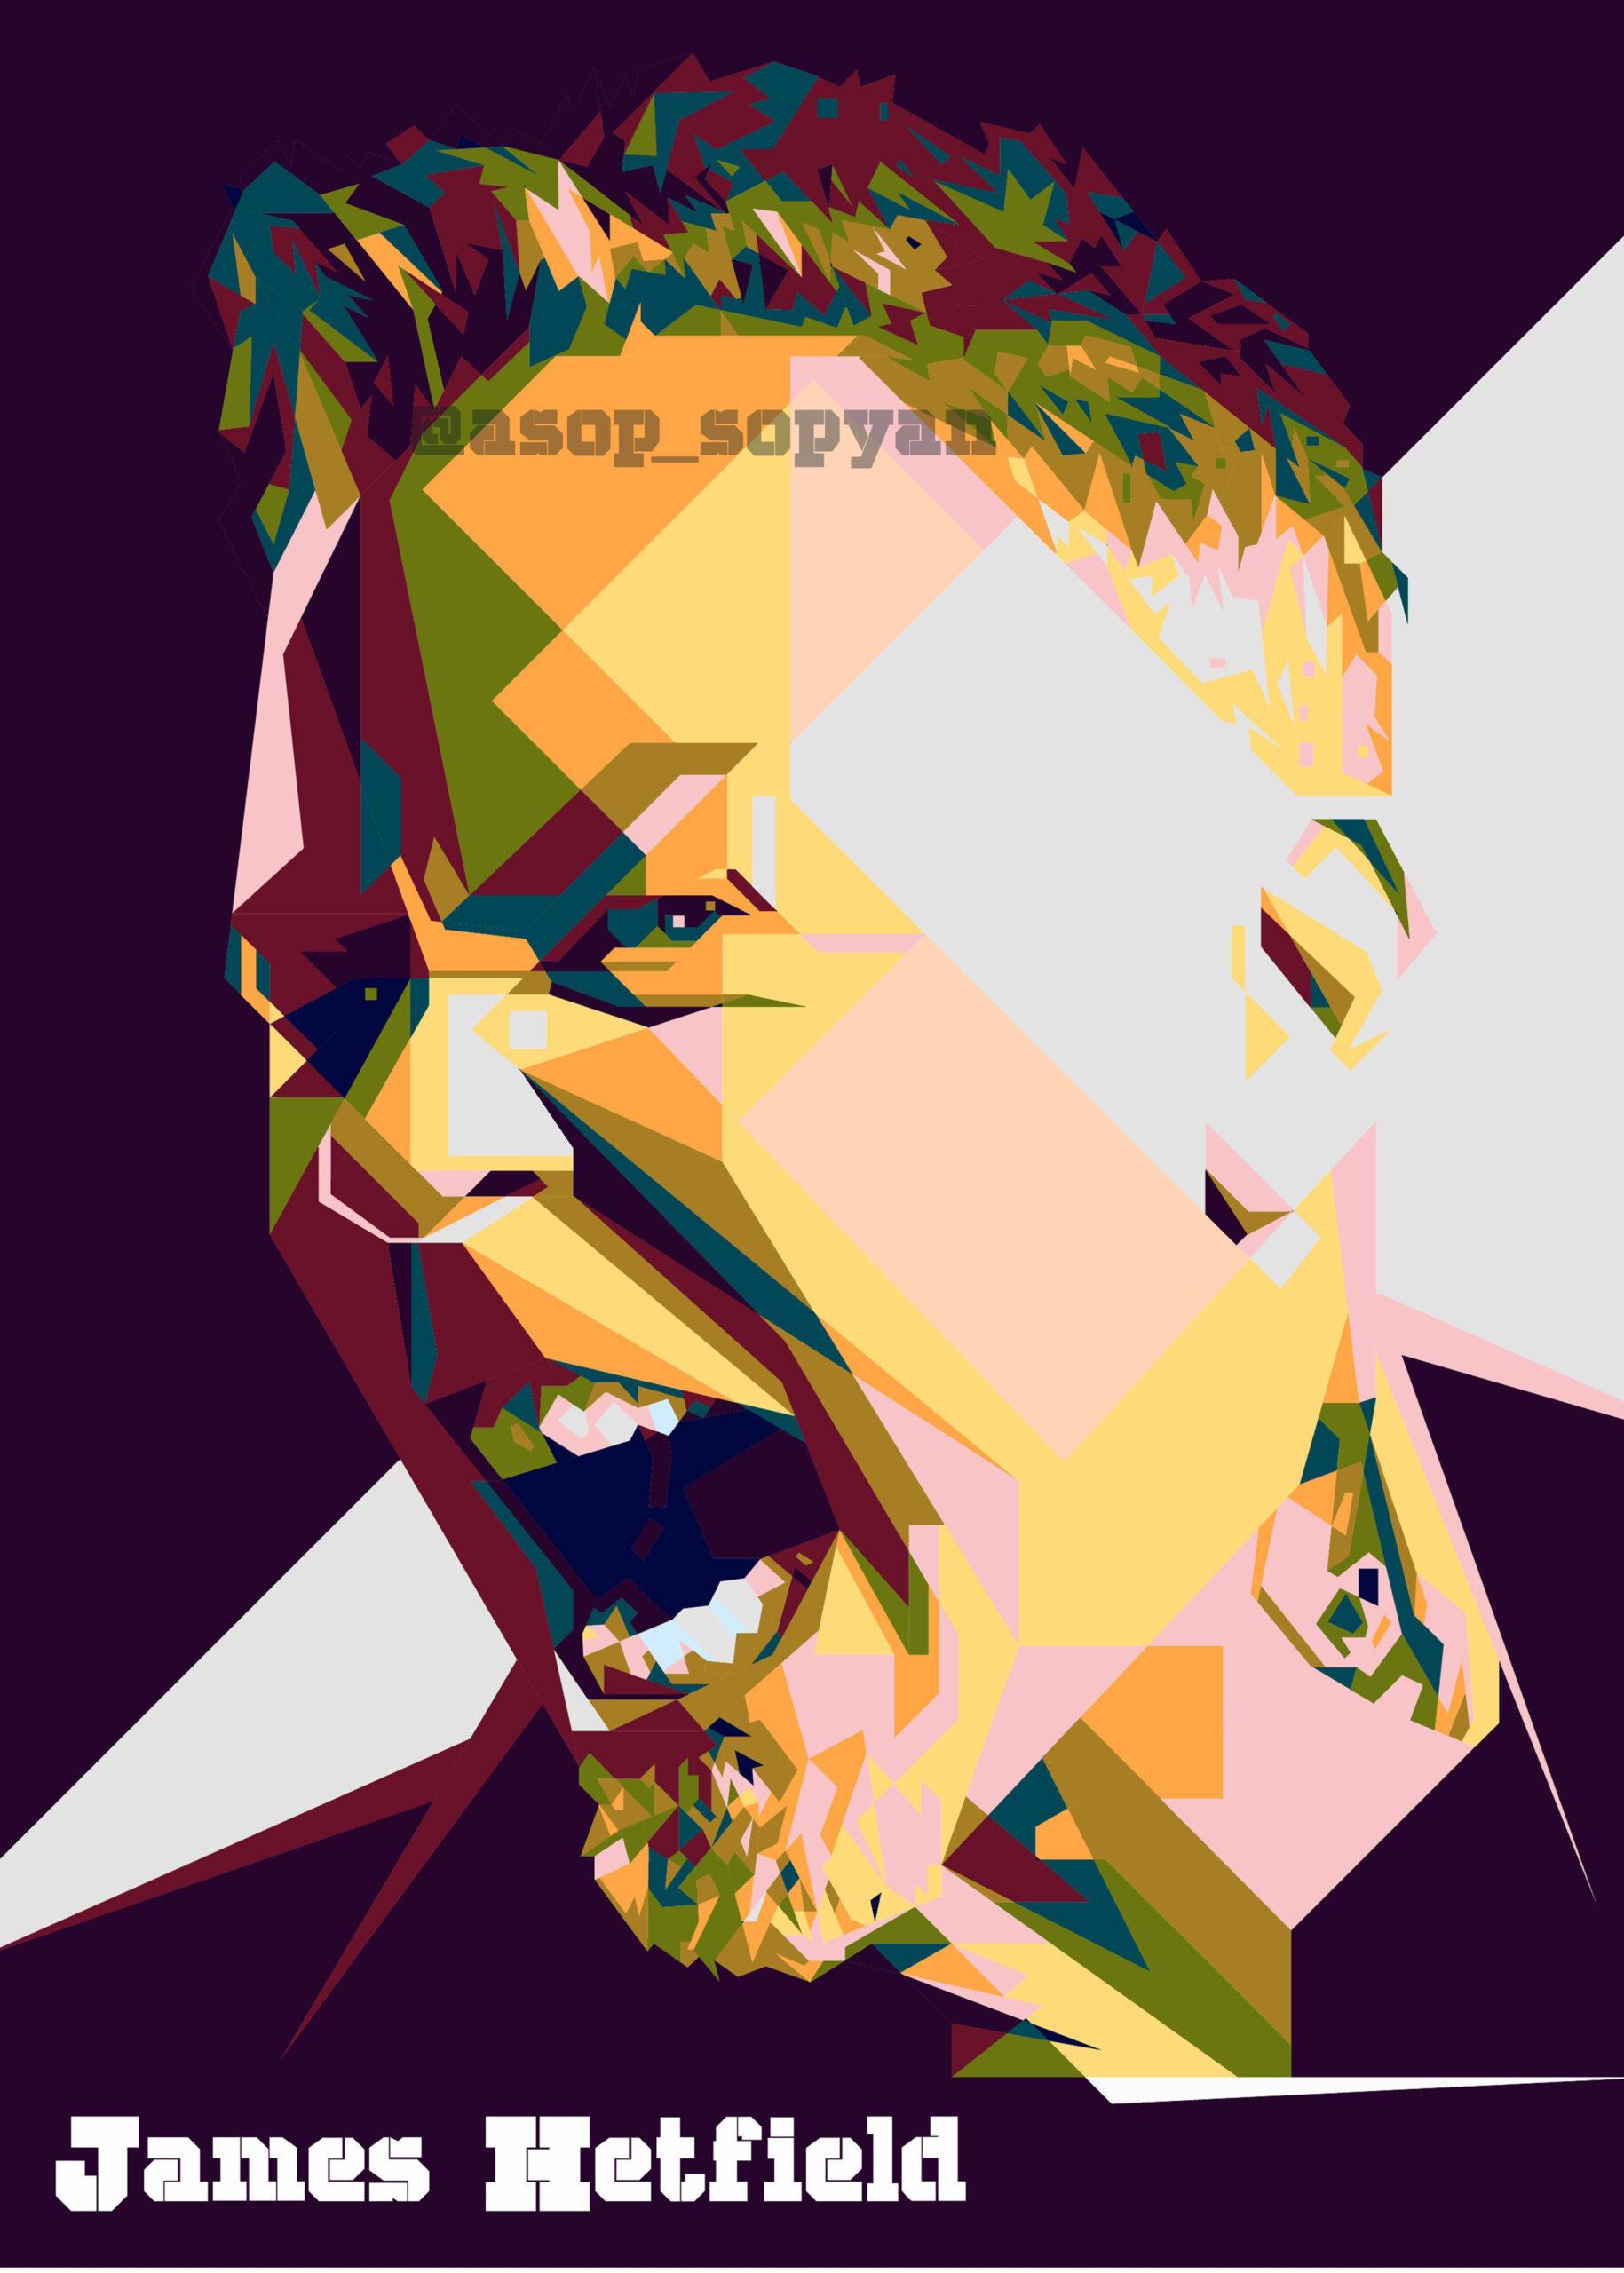 James Hetfield' Poster Printkang Sopyan | Displate In pertaining to Wpa Wpart Co